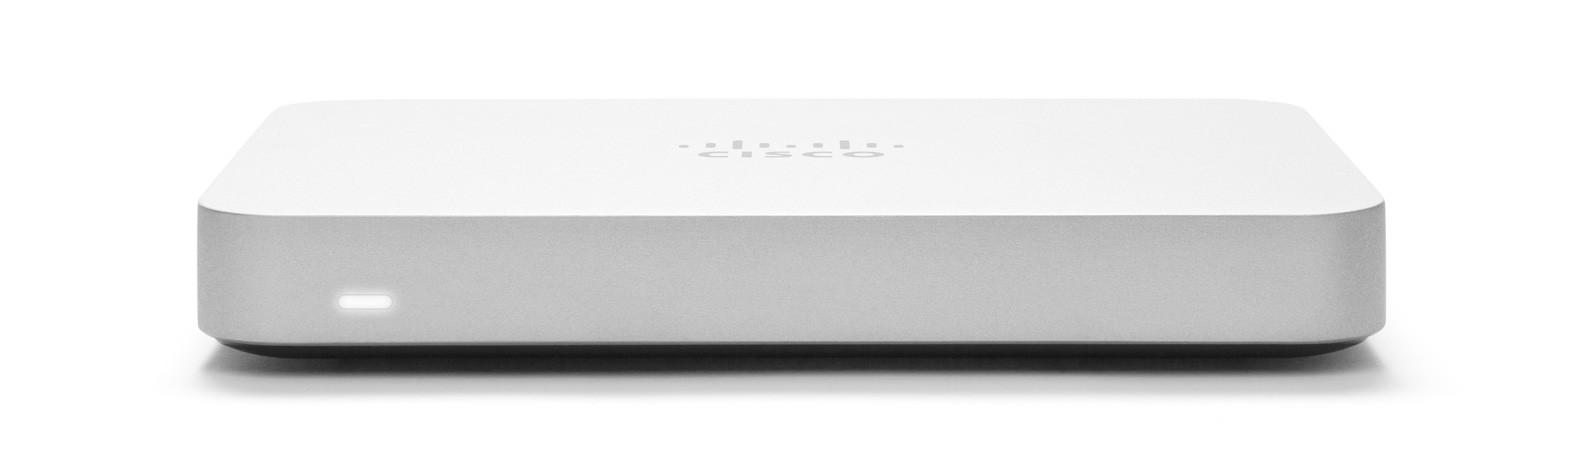 Cisco Meraki Z1 VPN-Gateway (Auslaufmodell)